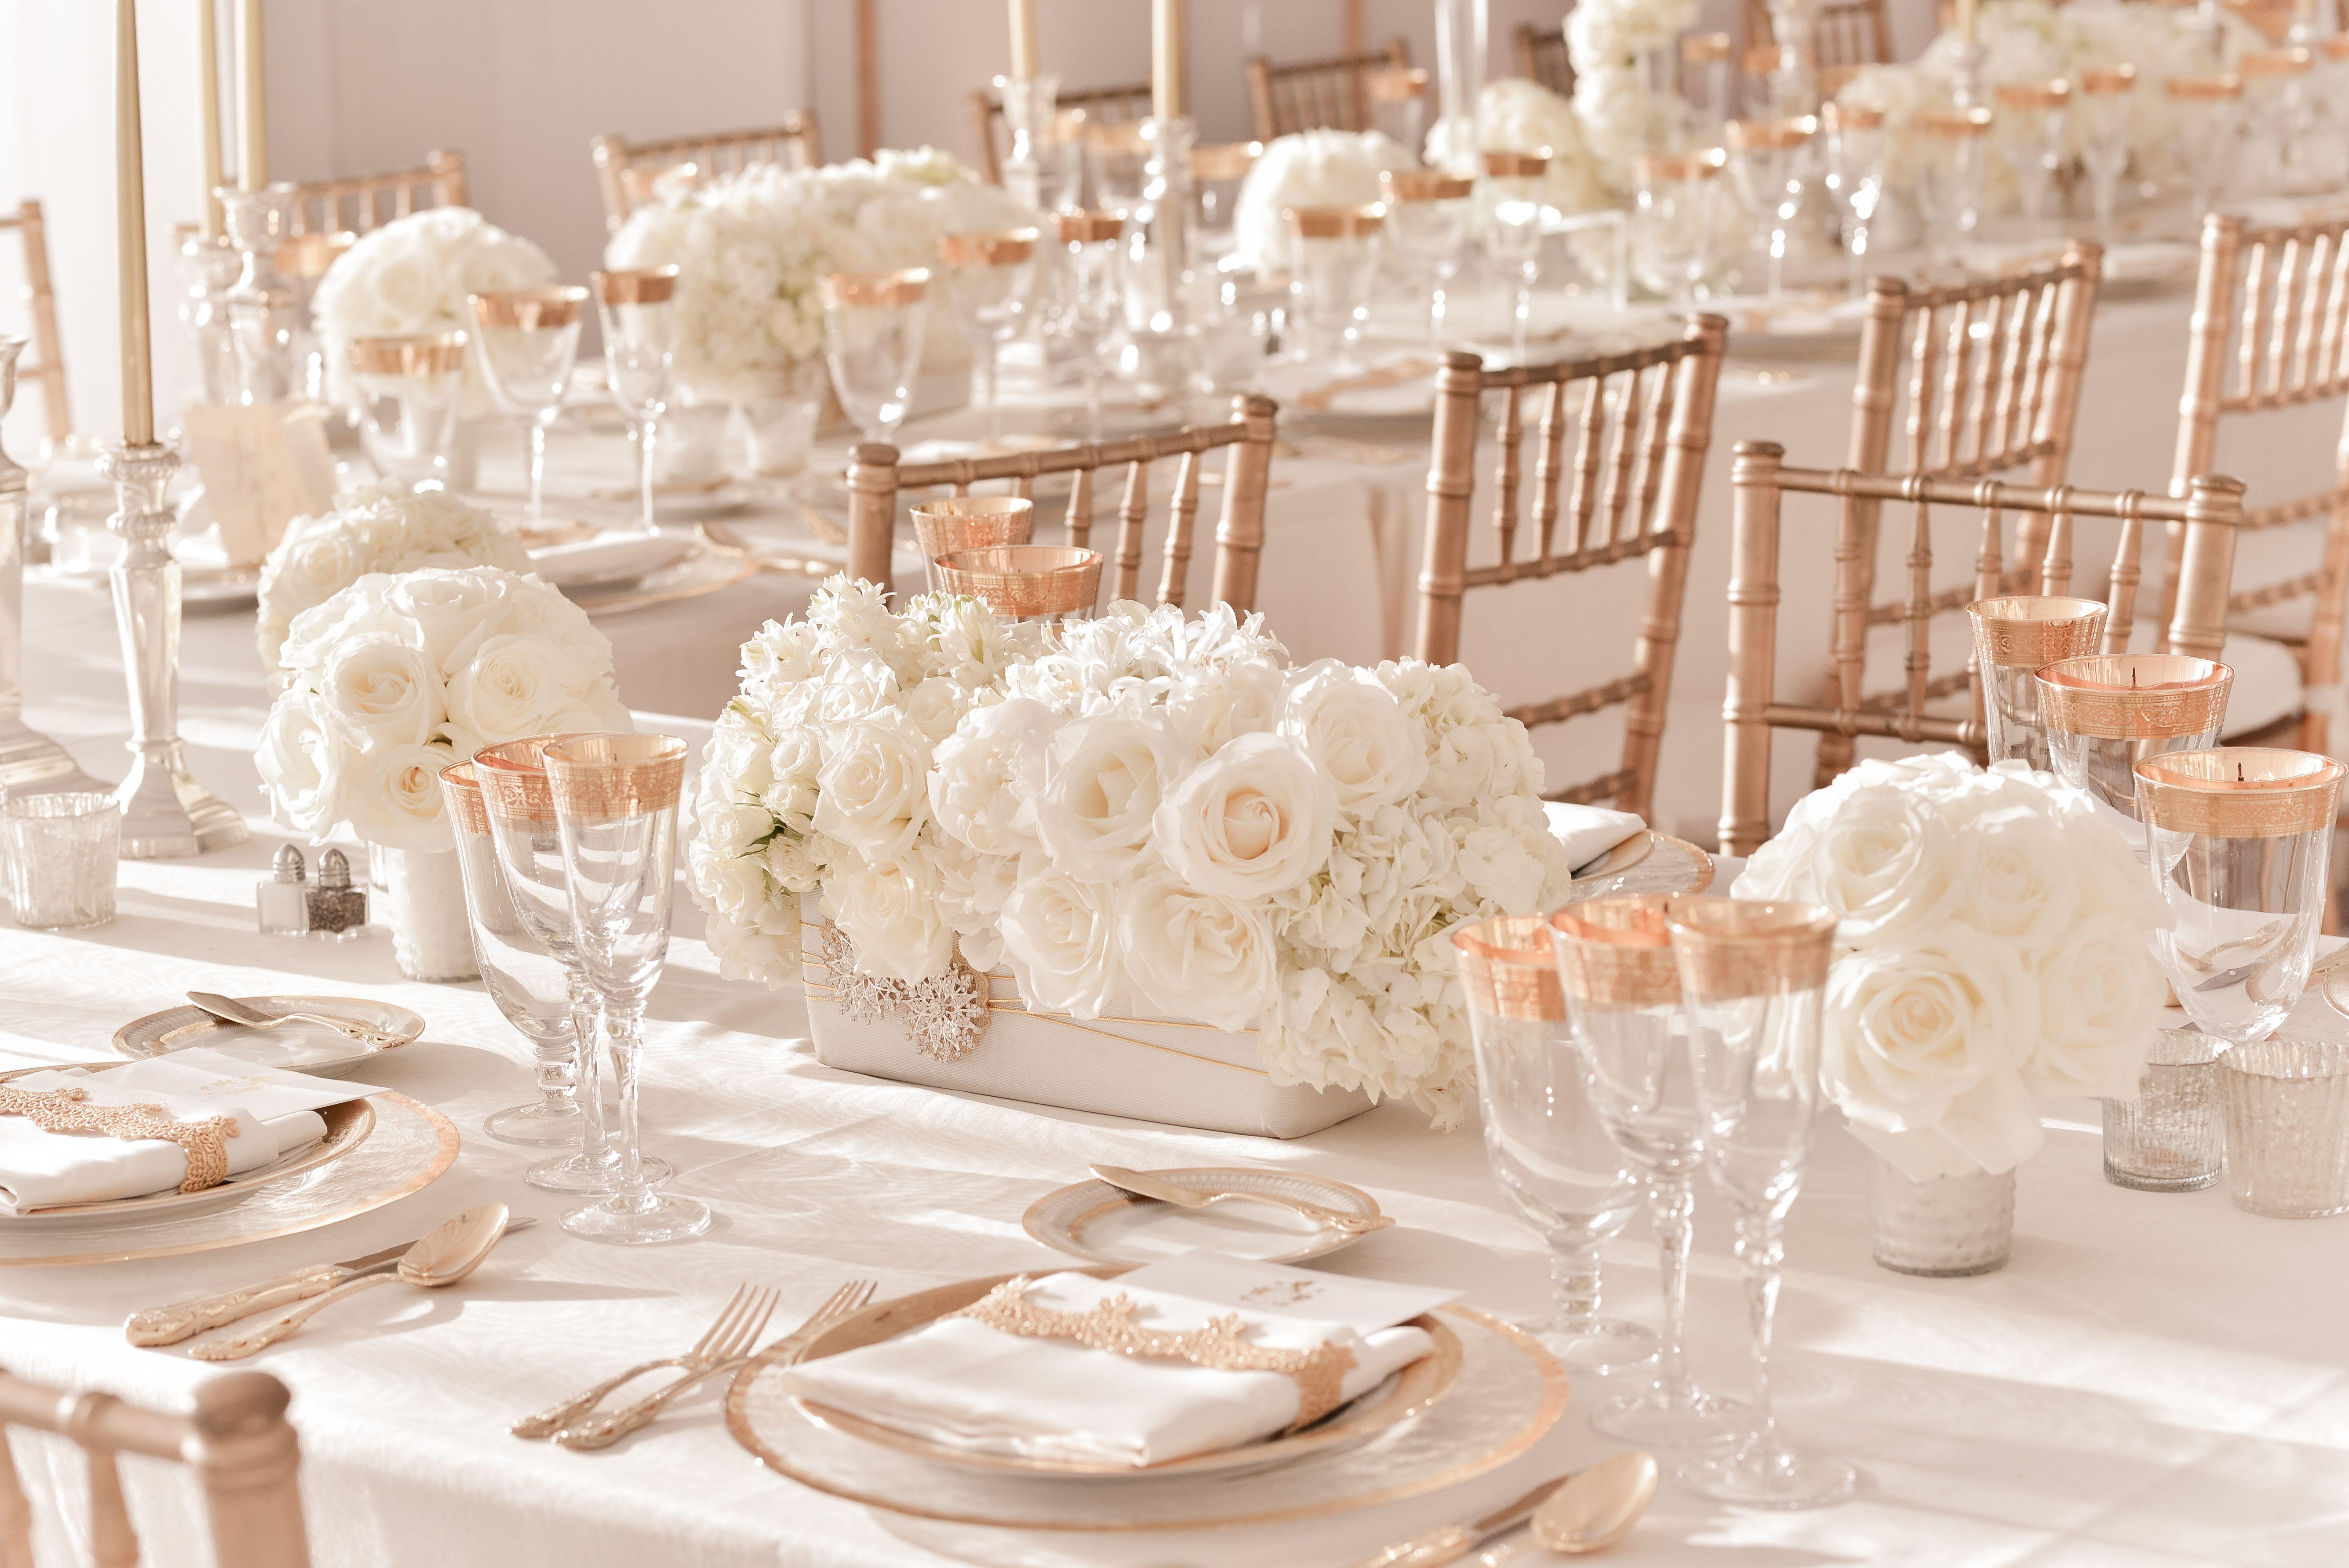 White wedding decoration ideas  Pix For ue Gold And White Wedding Centerpieces  Flowers  Pinterest